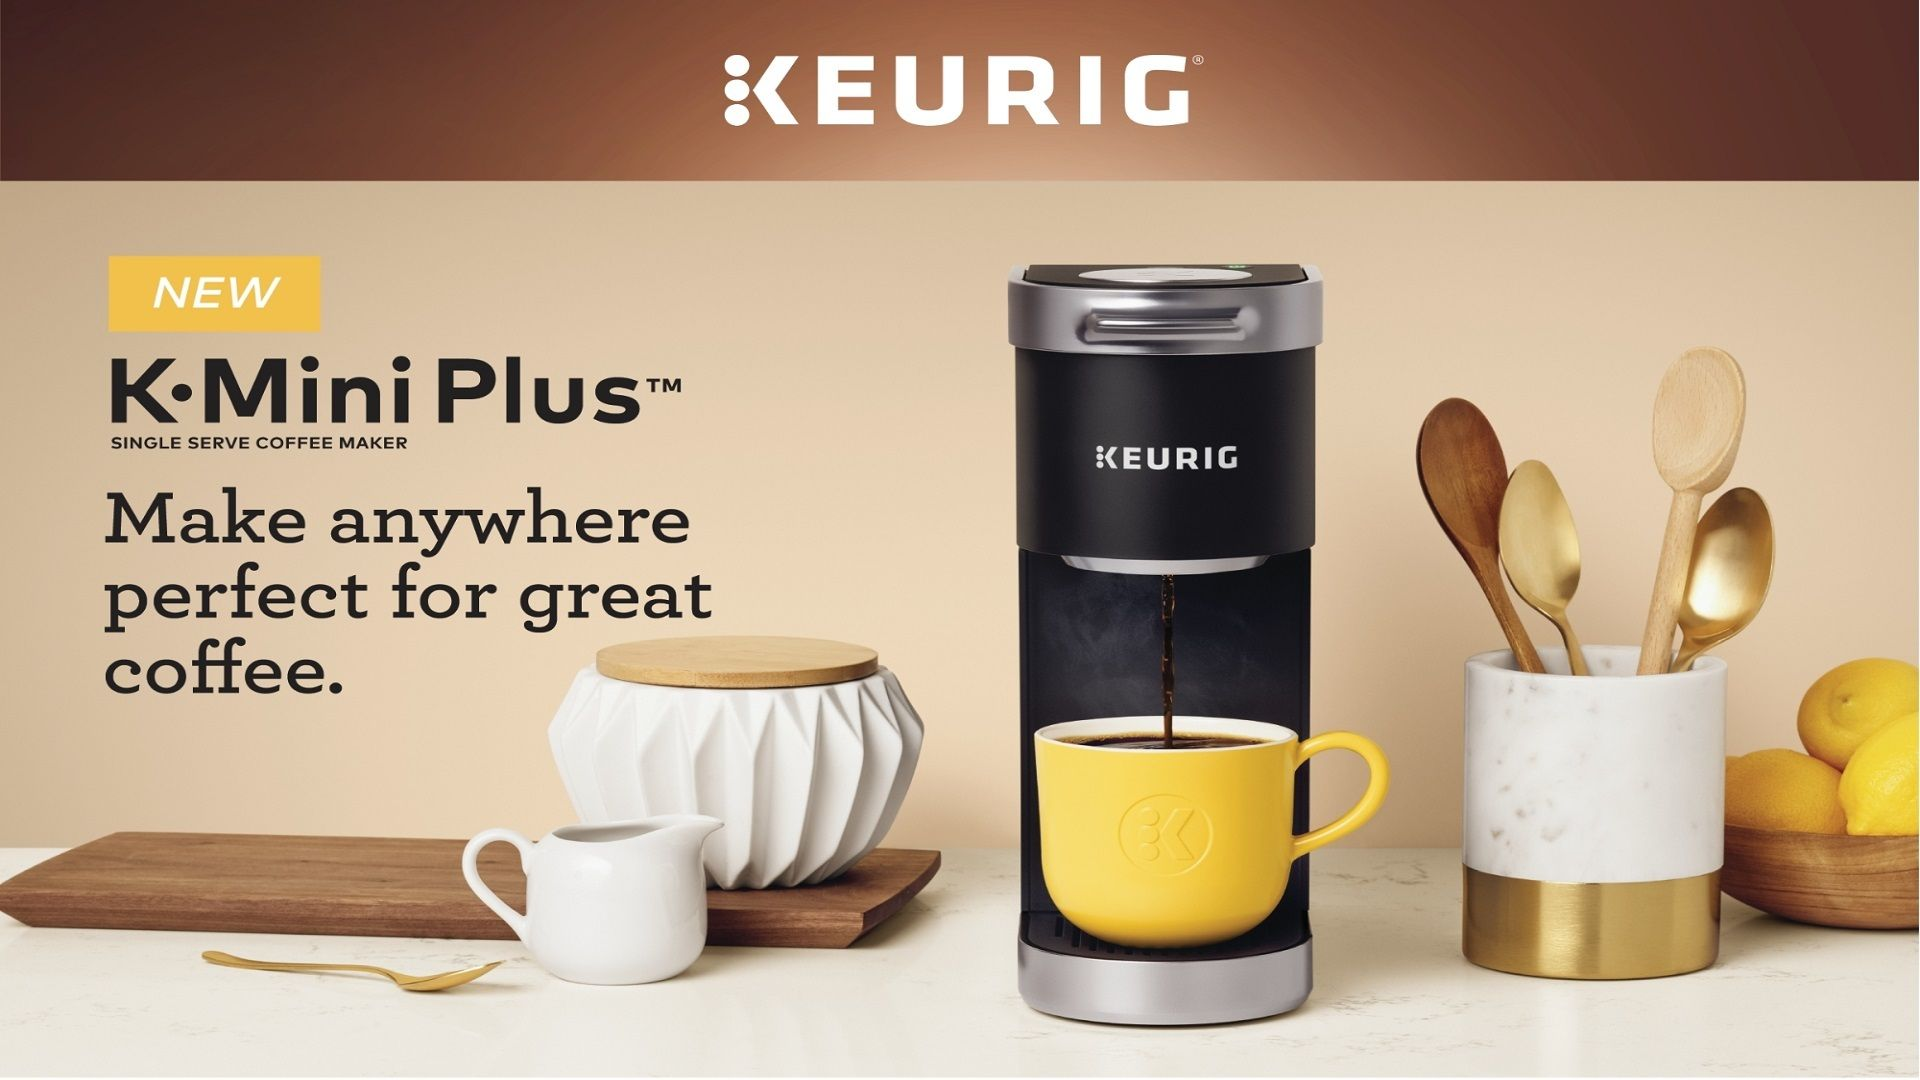 Keurig® KMini Plus™ Single Serve Coffee Maker in 2020